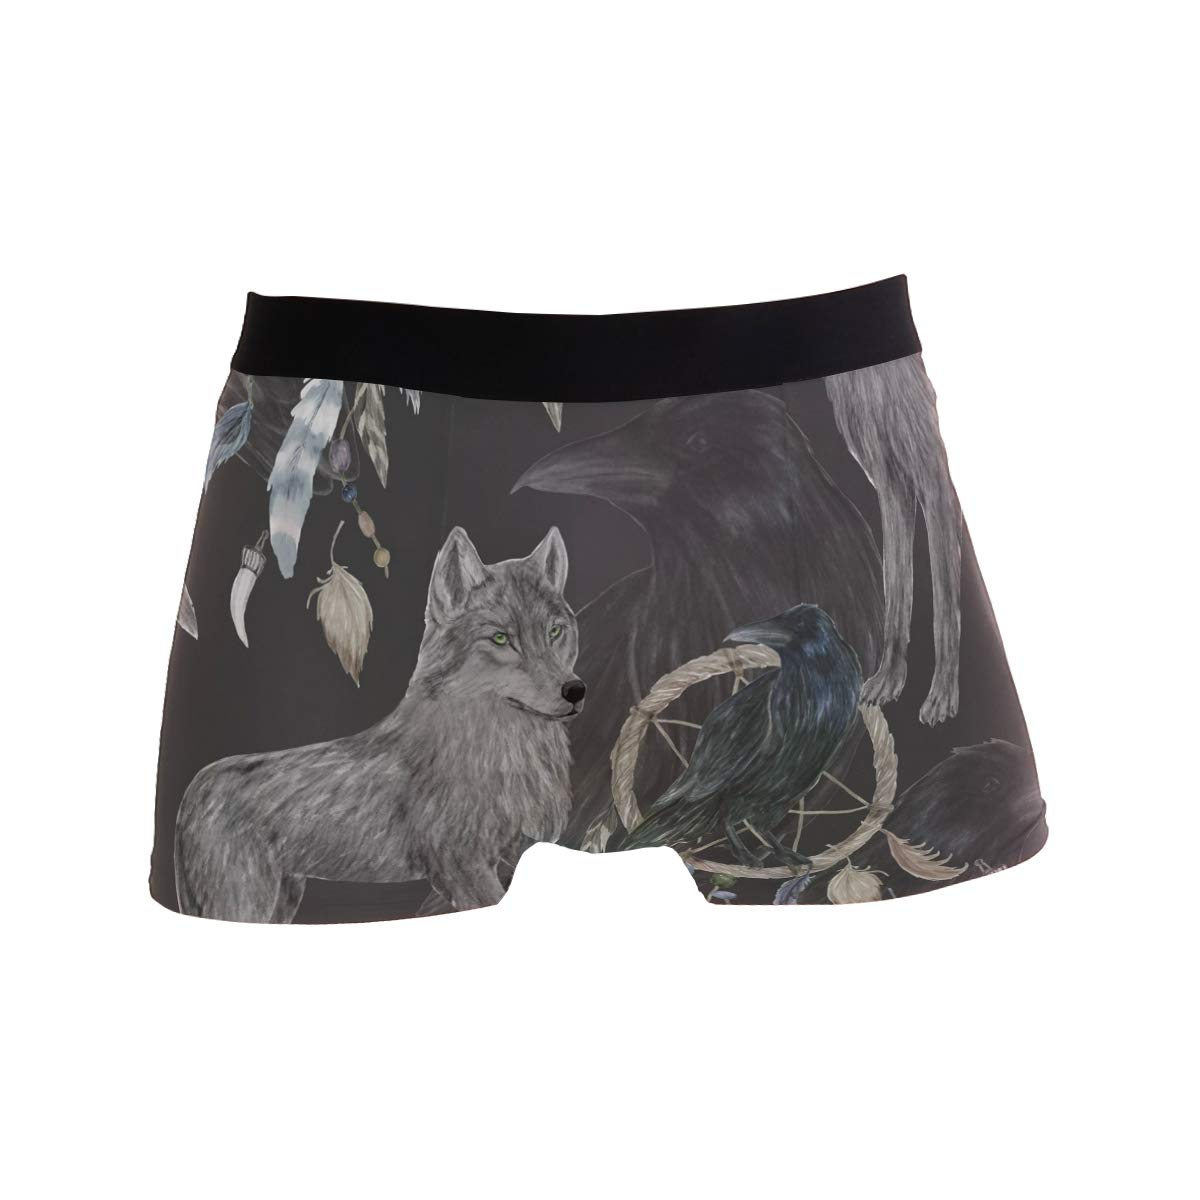 BETTKEN Mens Boxer Briefs Animal Wolf Boho Feather Short Underwear Soft Stretch Underpants for Men Boys S-XL